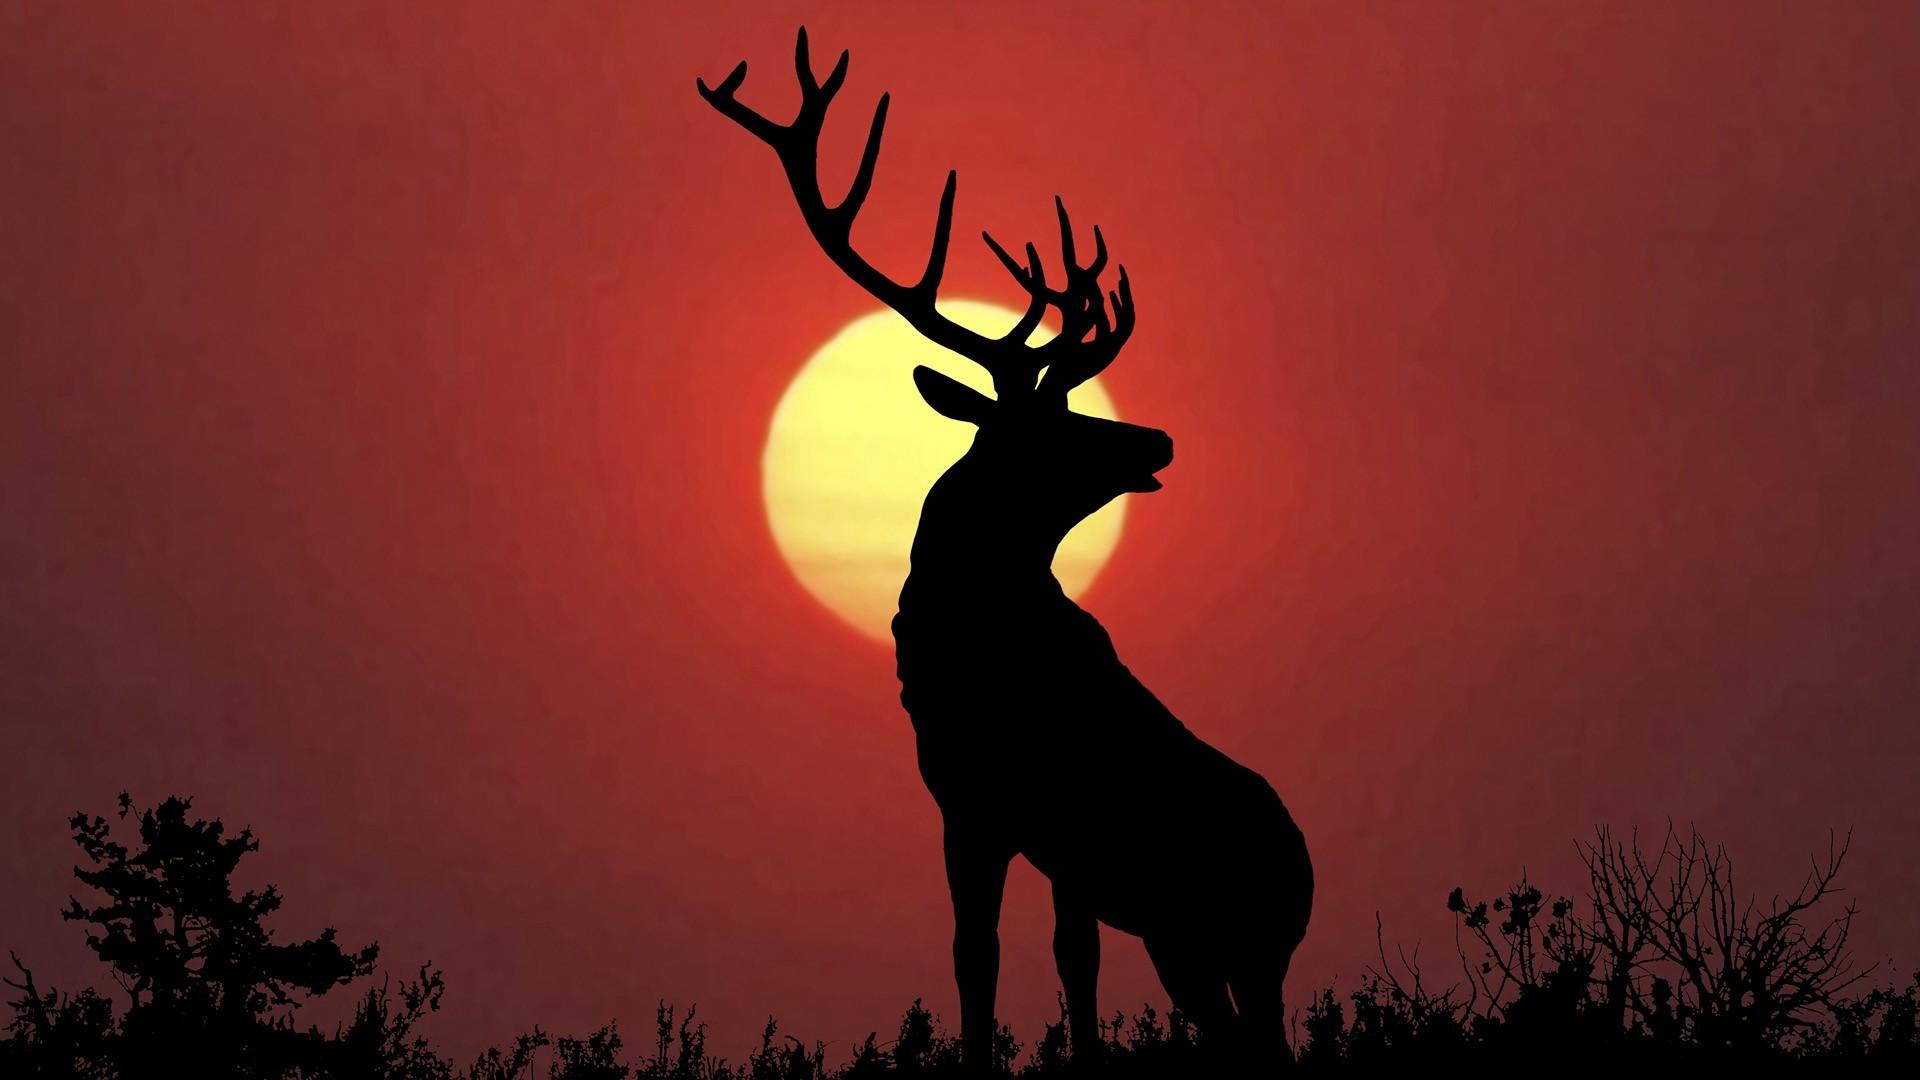 Elk Background Wallpaper